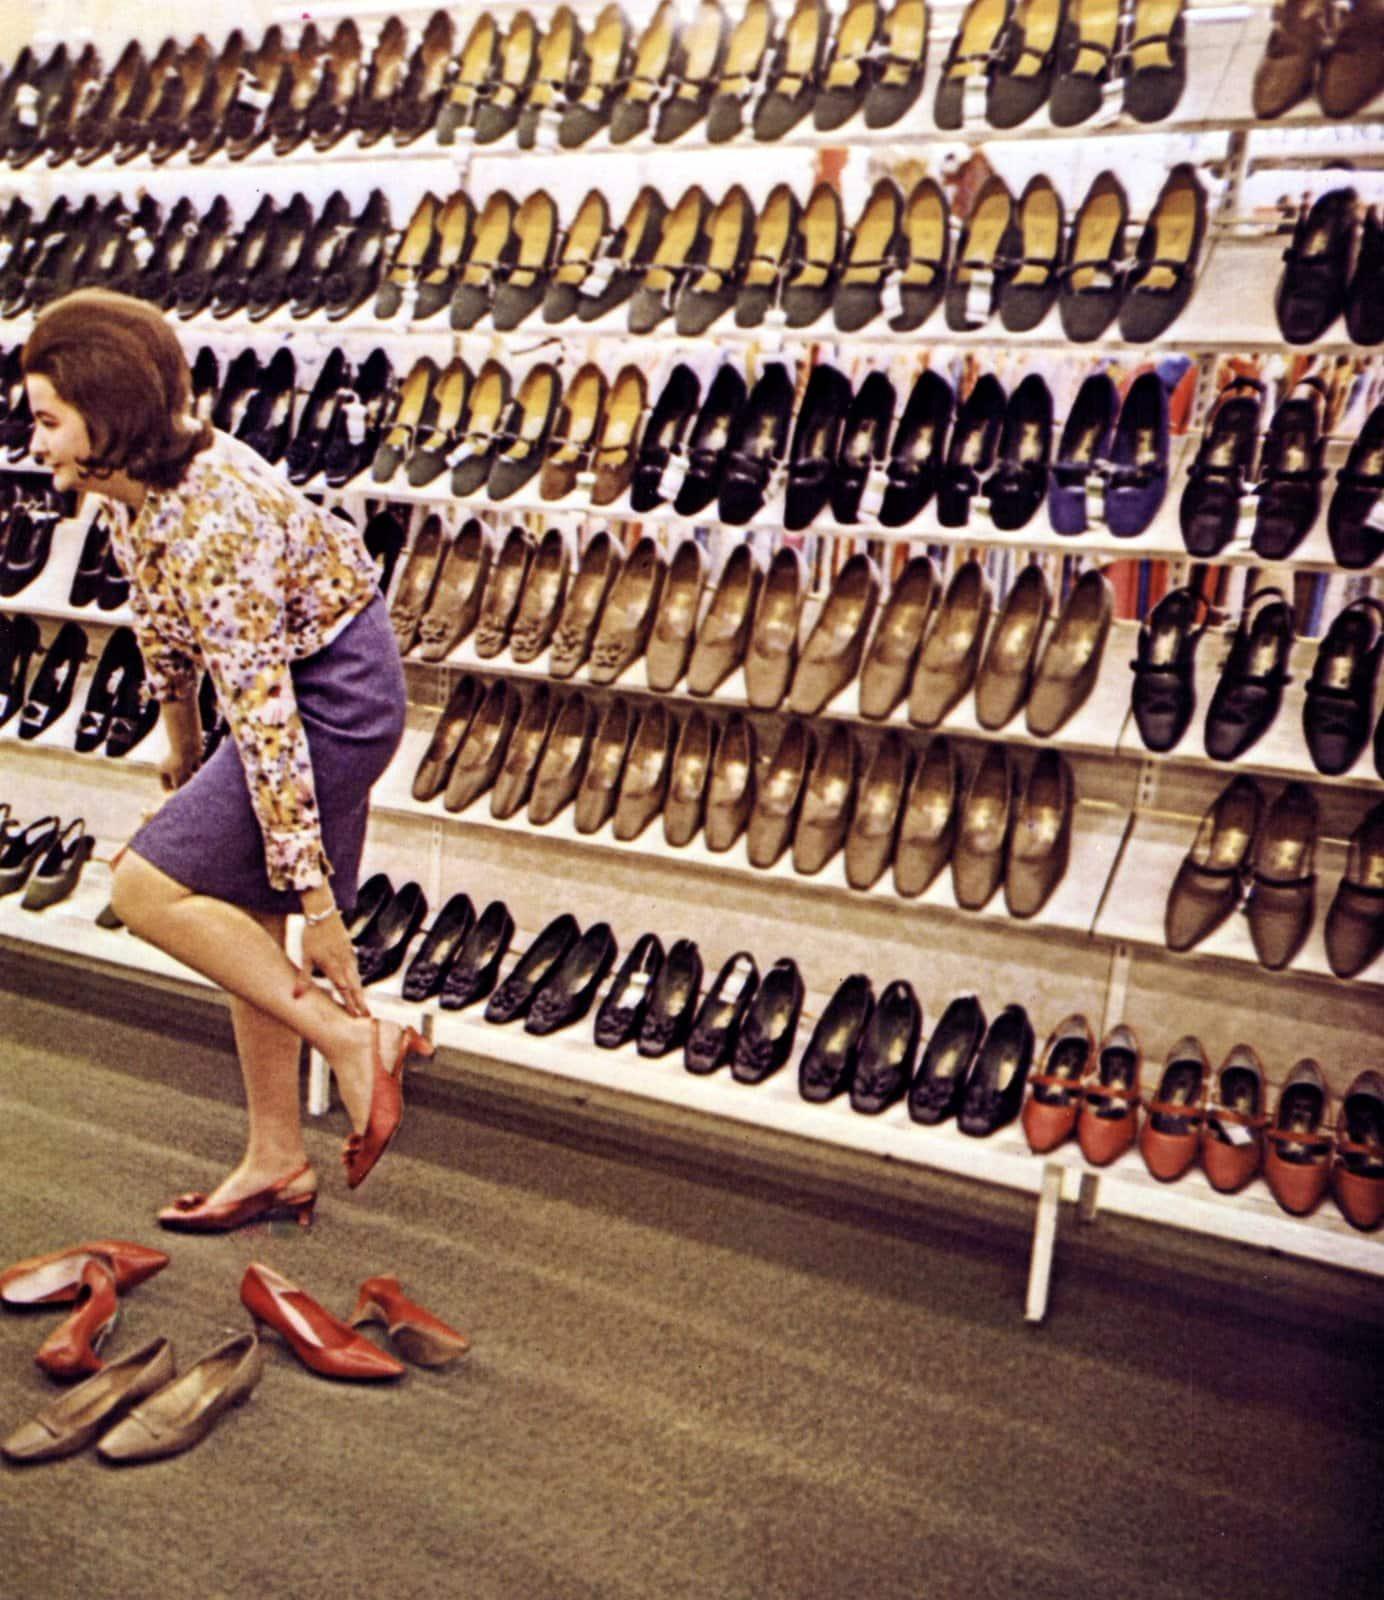 Vintage sixties self-service women's shoe store (1967)